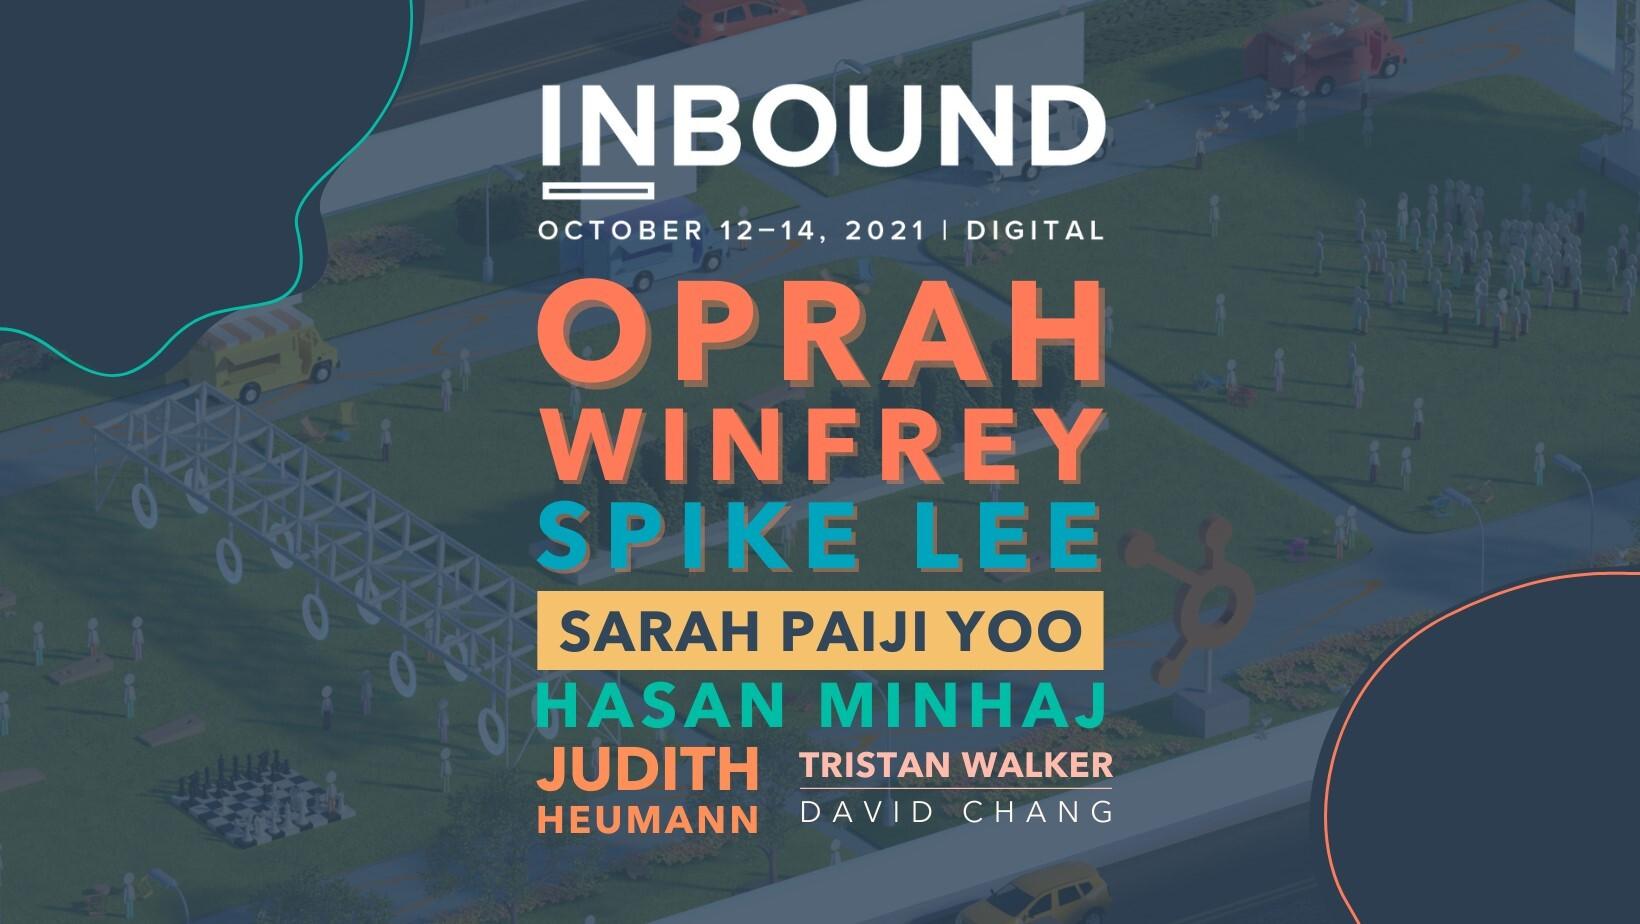 Inbound 2021 HubSpot Event Speakers | Inbound 2021 Preview Blog